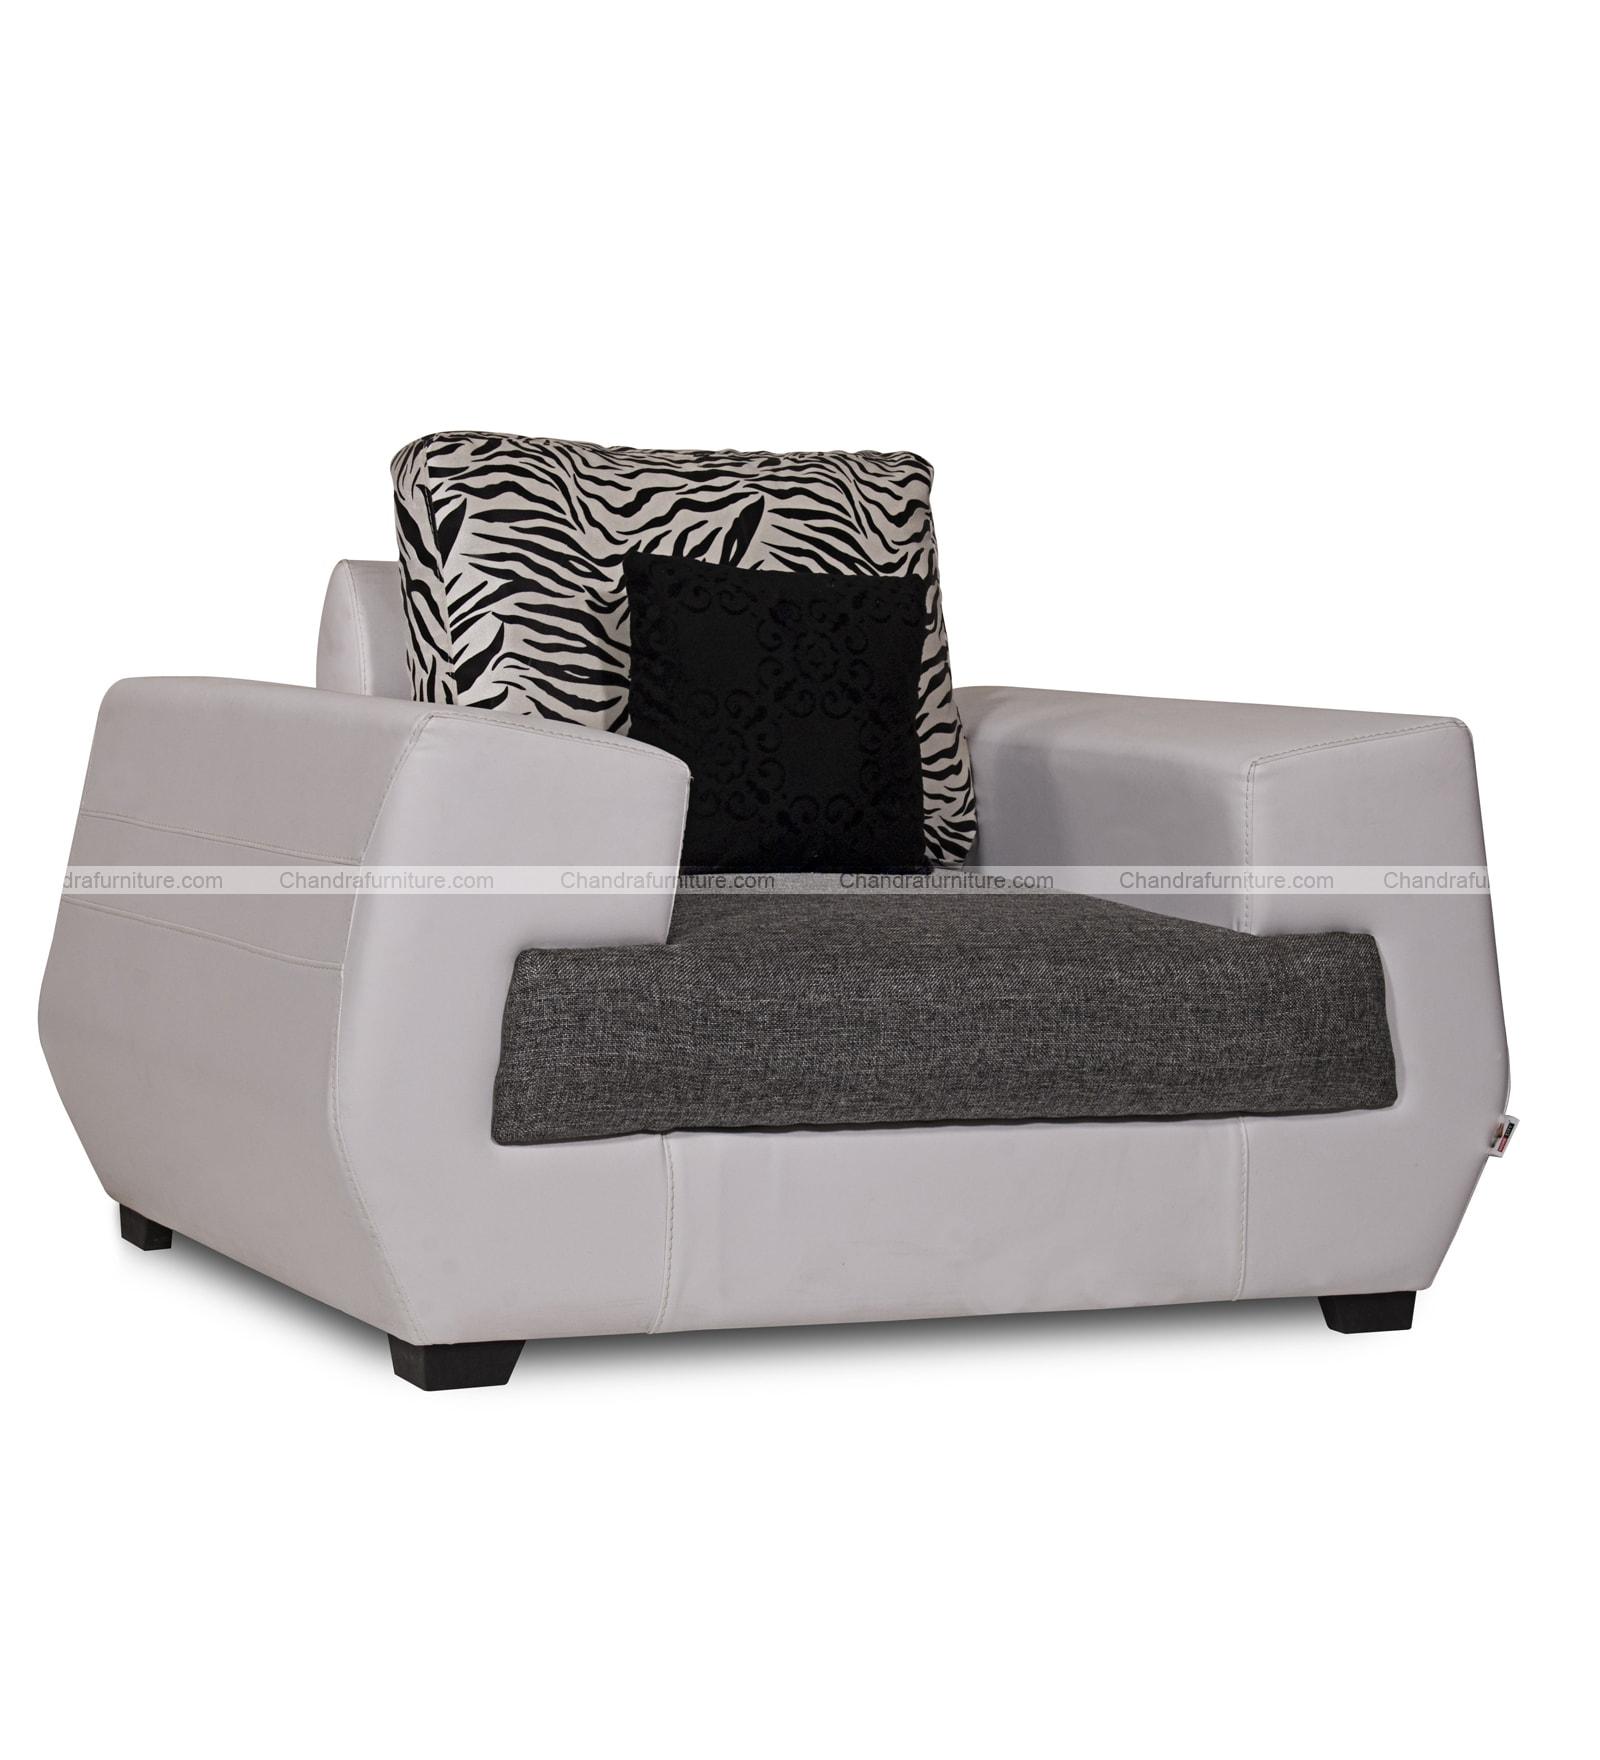 Chandra Furniture Vista Sofa Set In Fabric & Lathrite